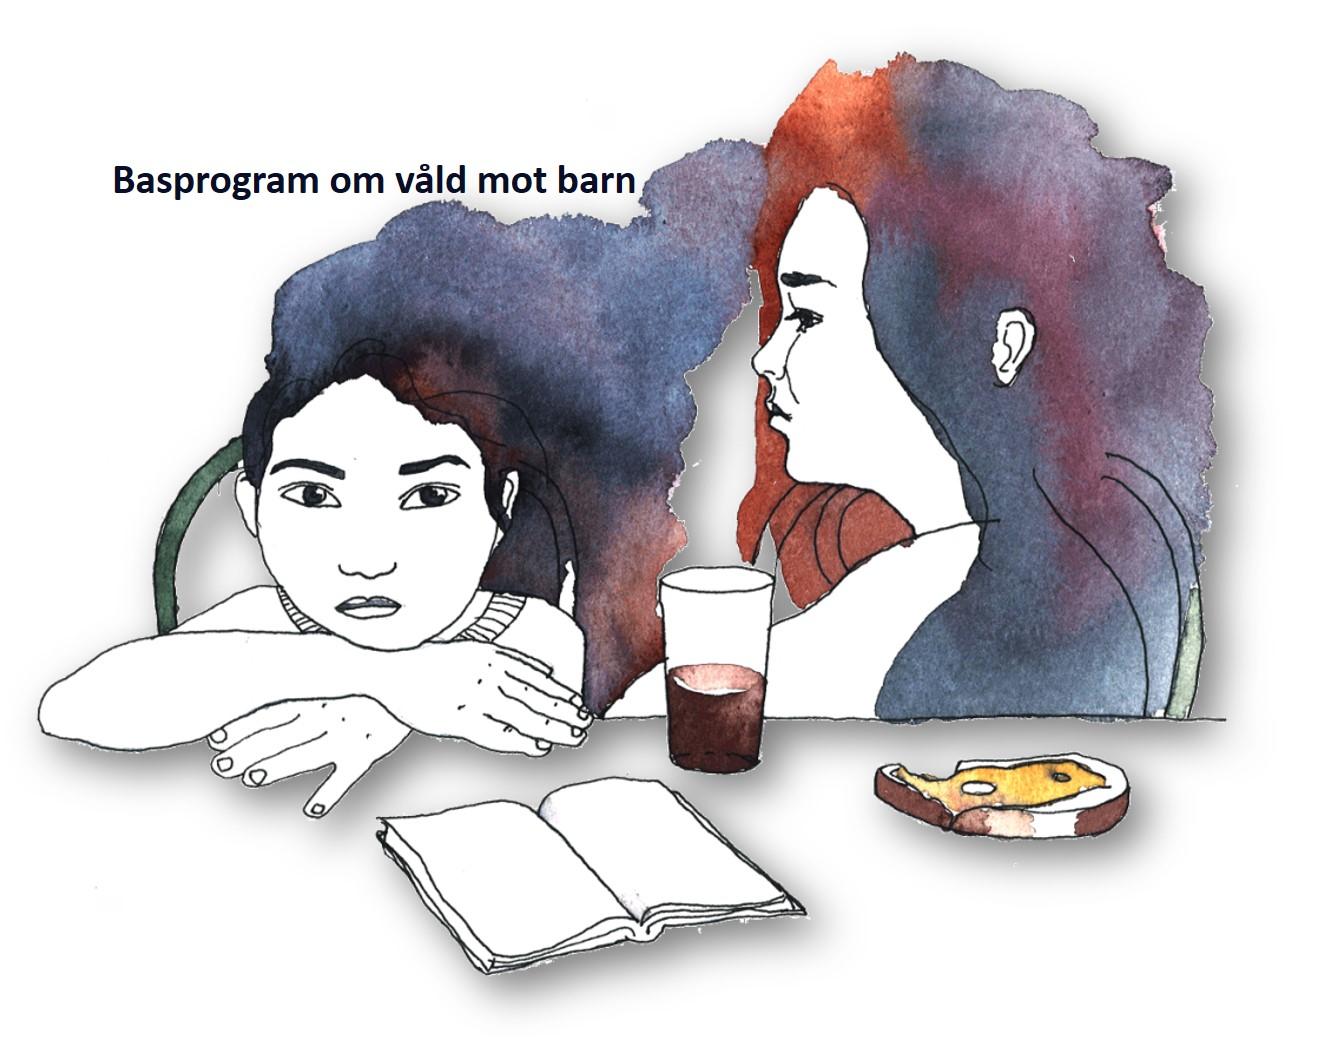 Basprogram om våld mot barn